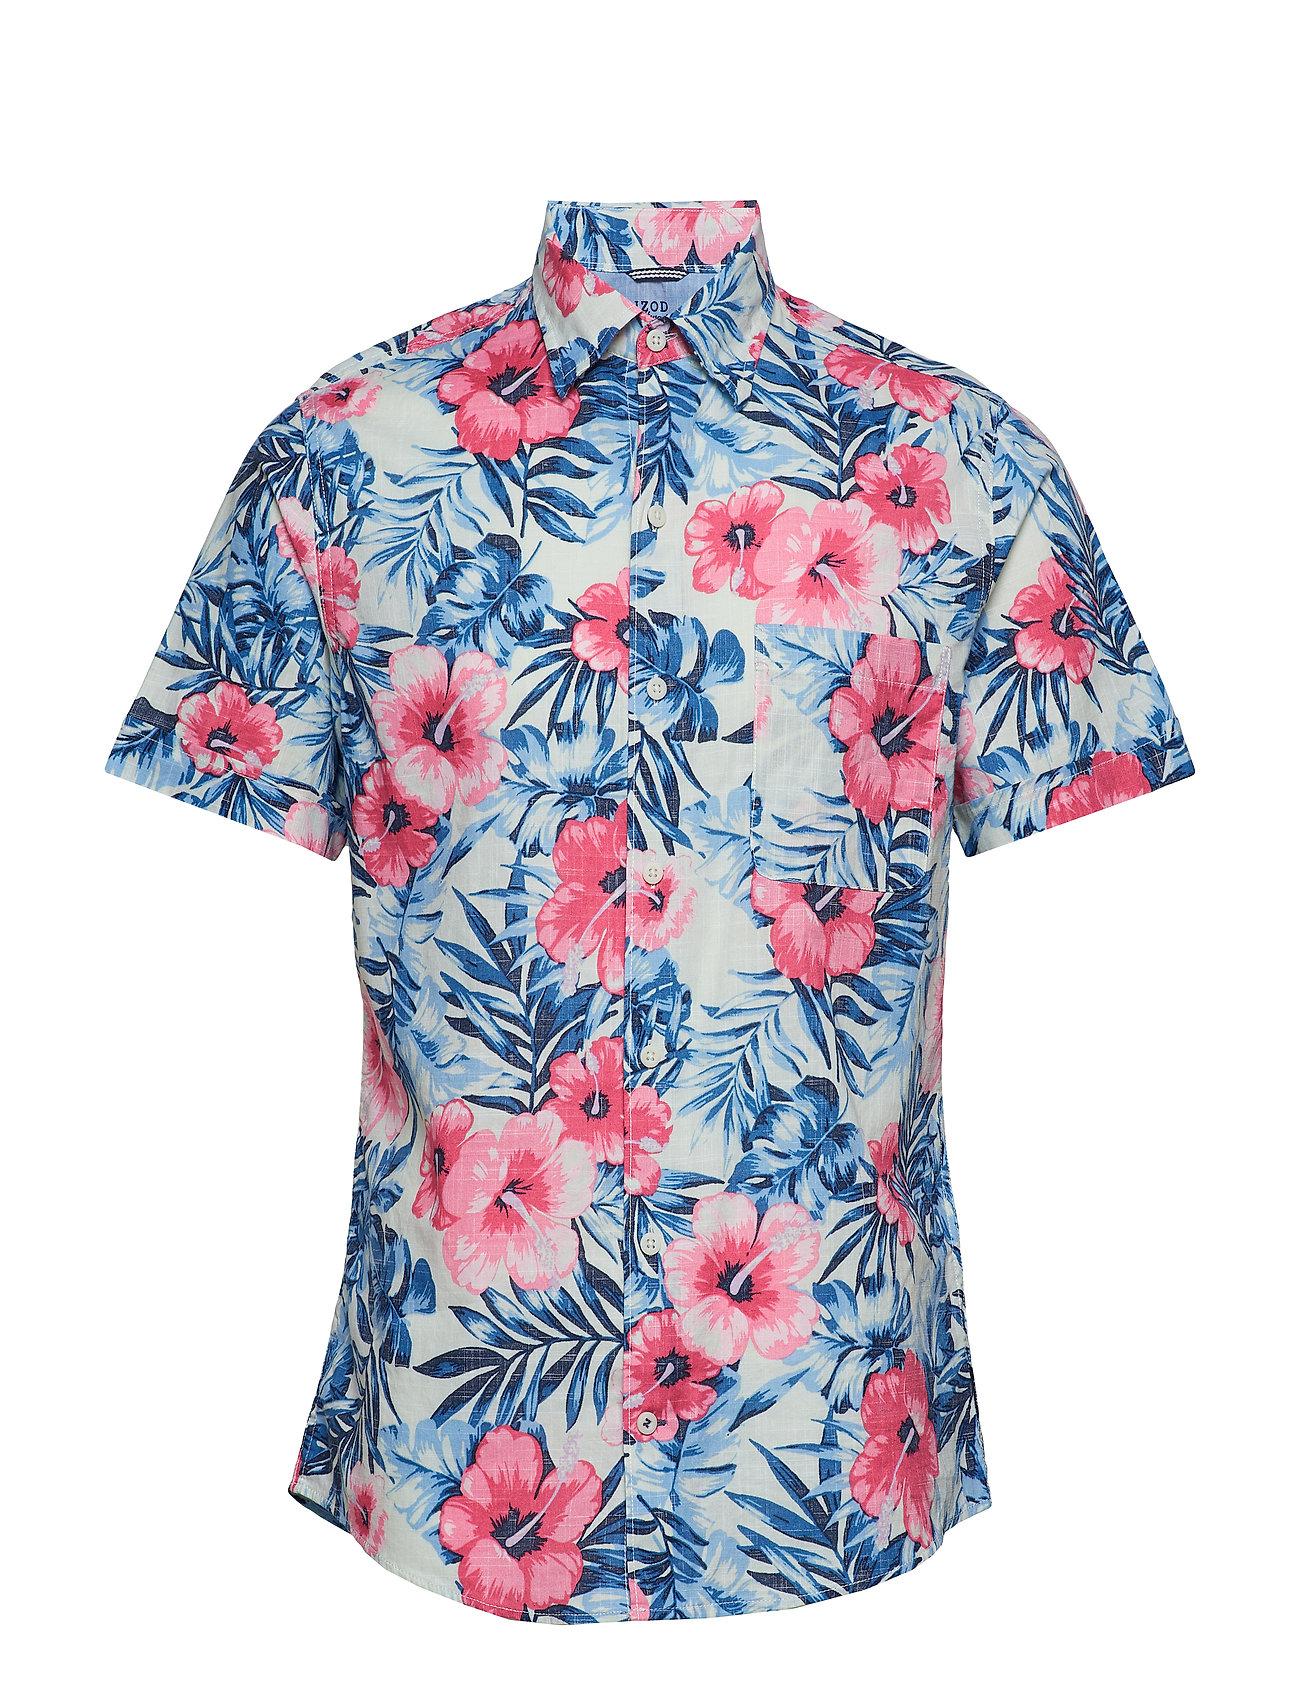 Shirtclearly Floral Print Bd Ss AquaIzod SVUzMp